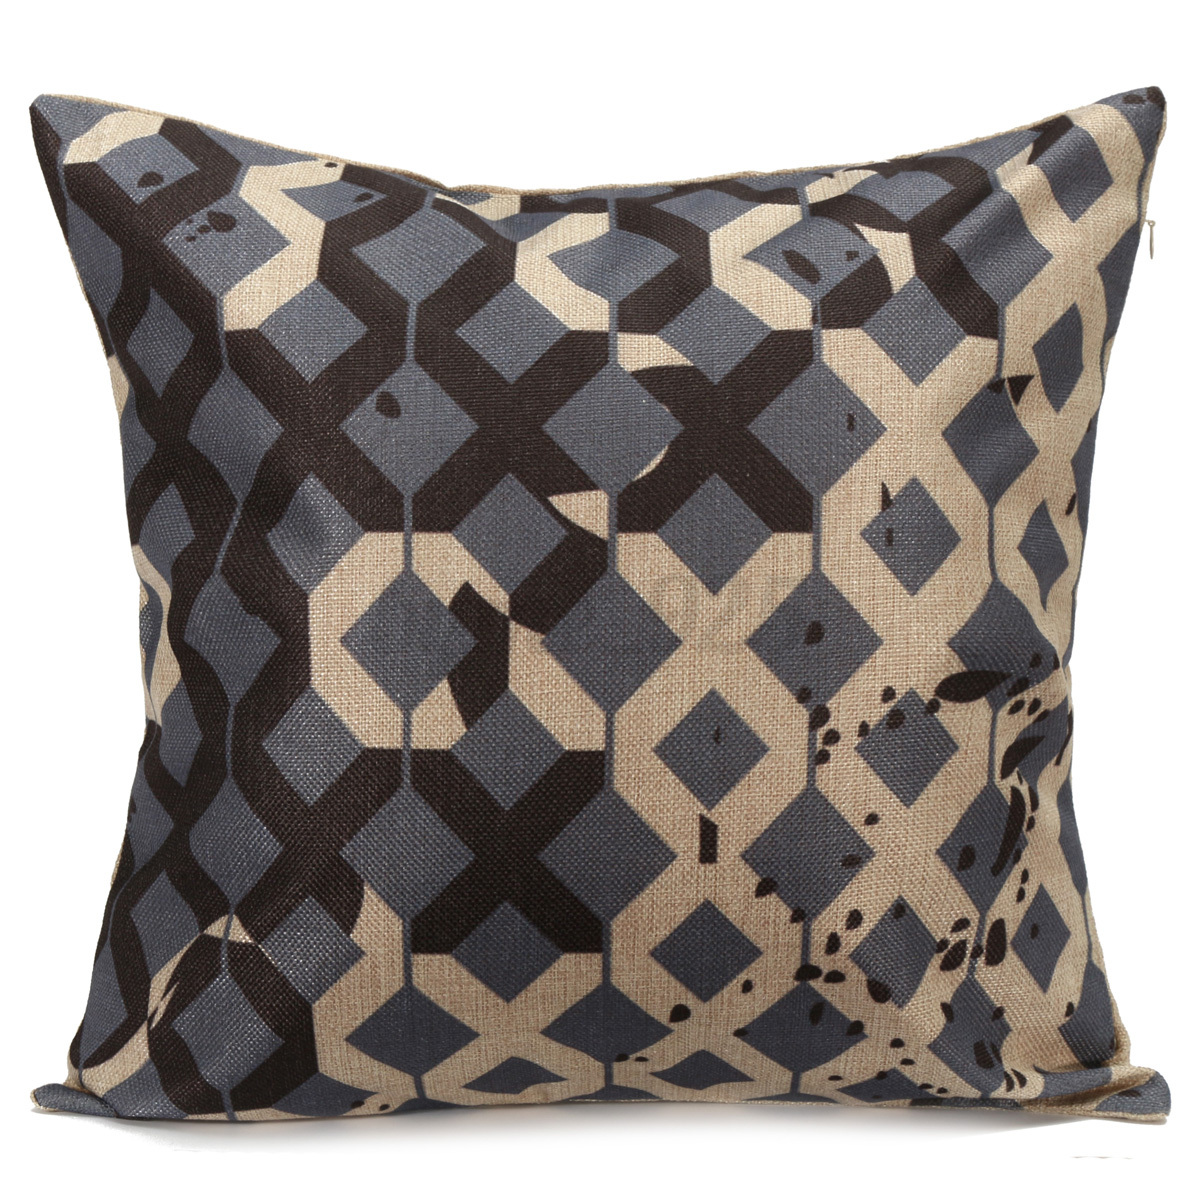 Cotton Linen Home Decor Throw Pillow Case Cushion Cover Geometry Nature eBay